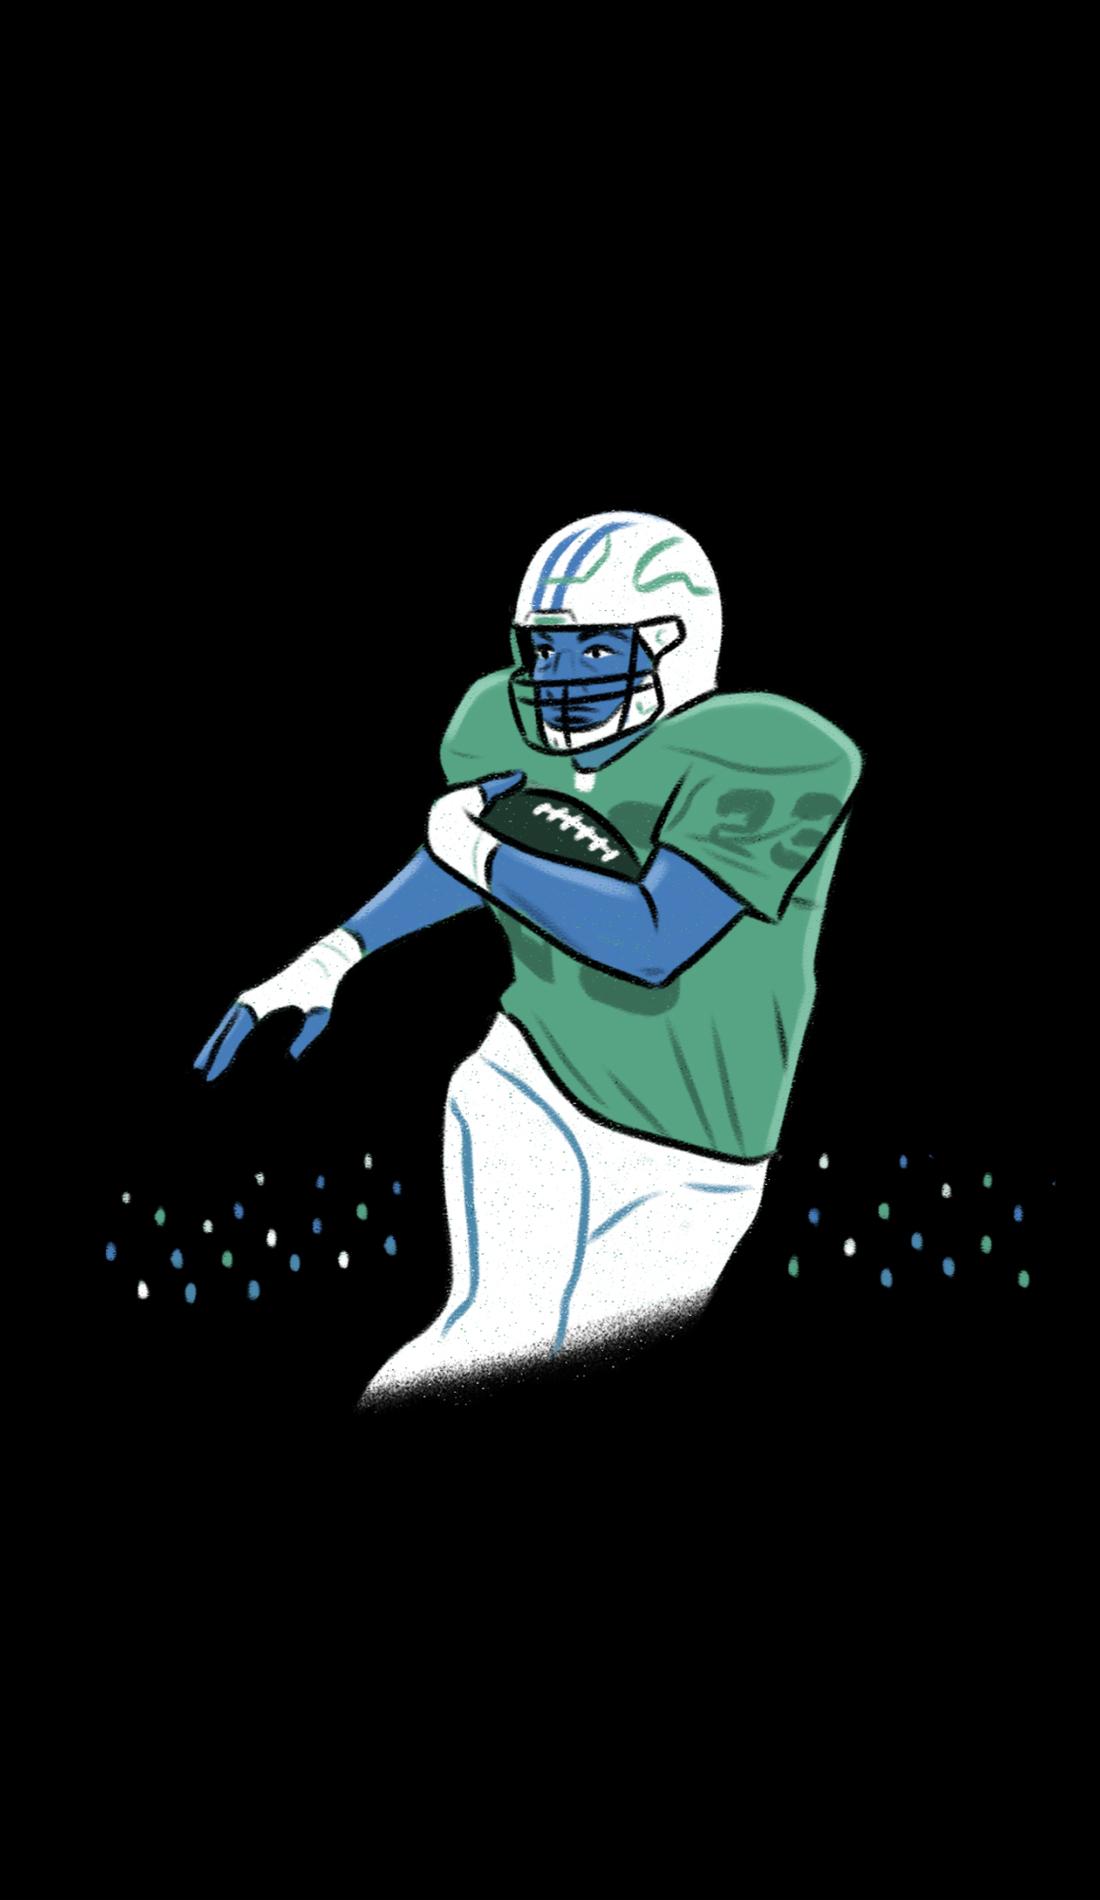 A North Dakota Fighting Hawks Football live event